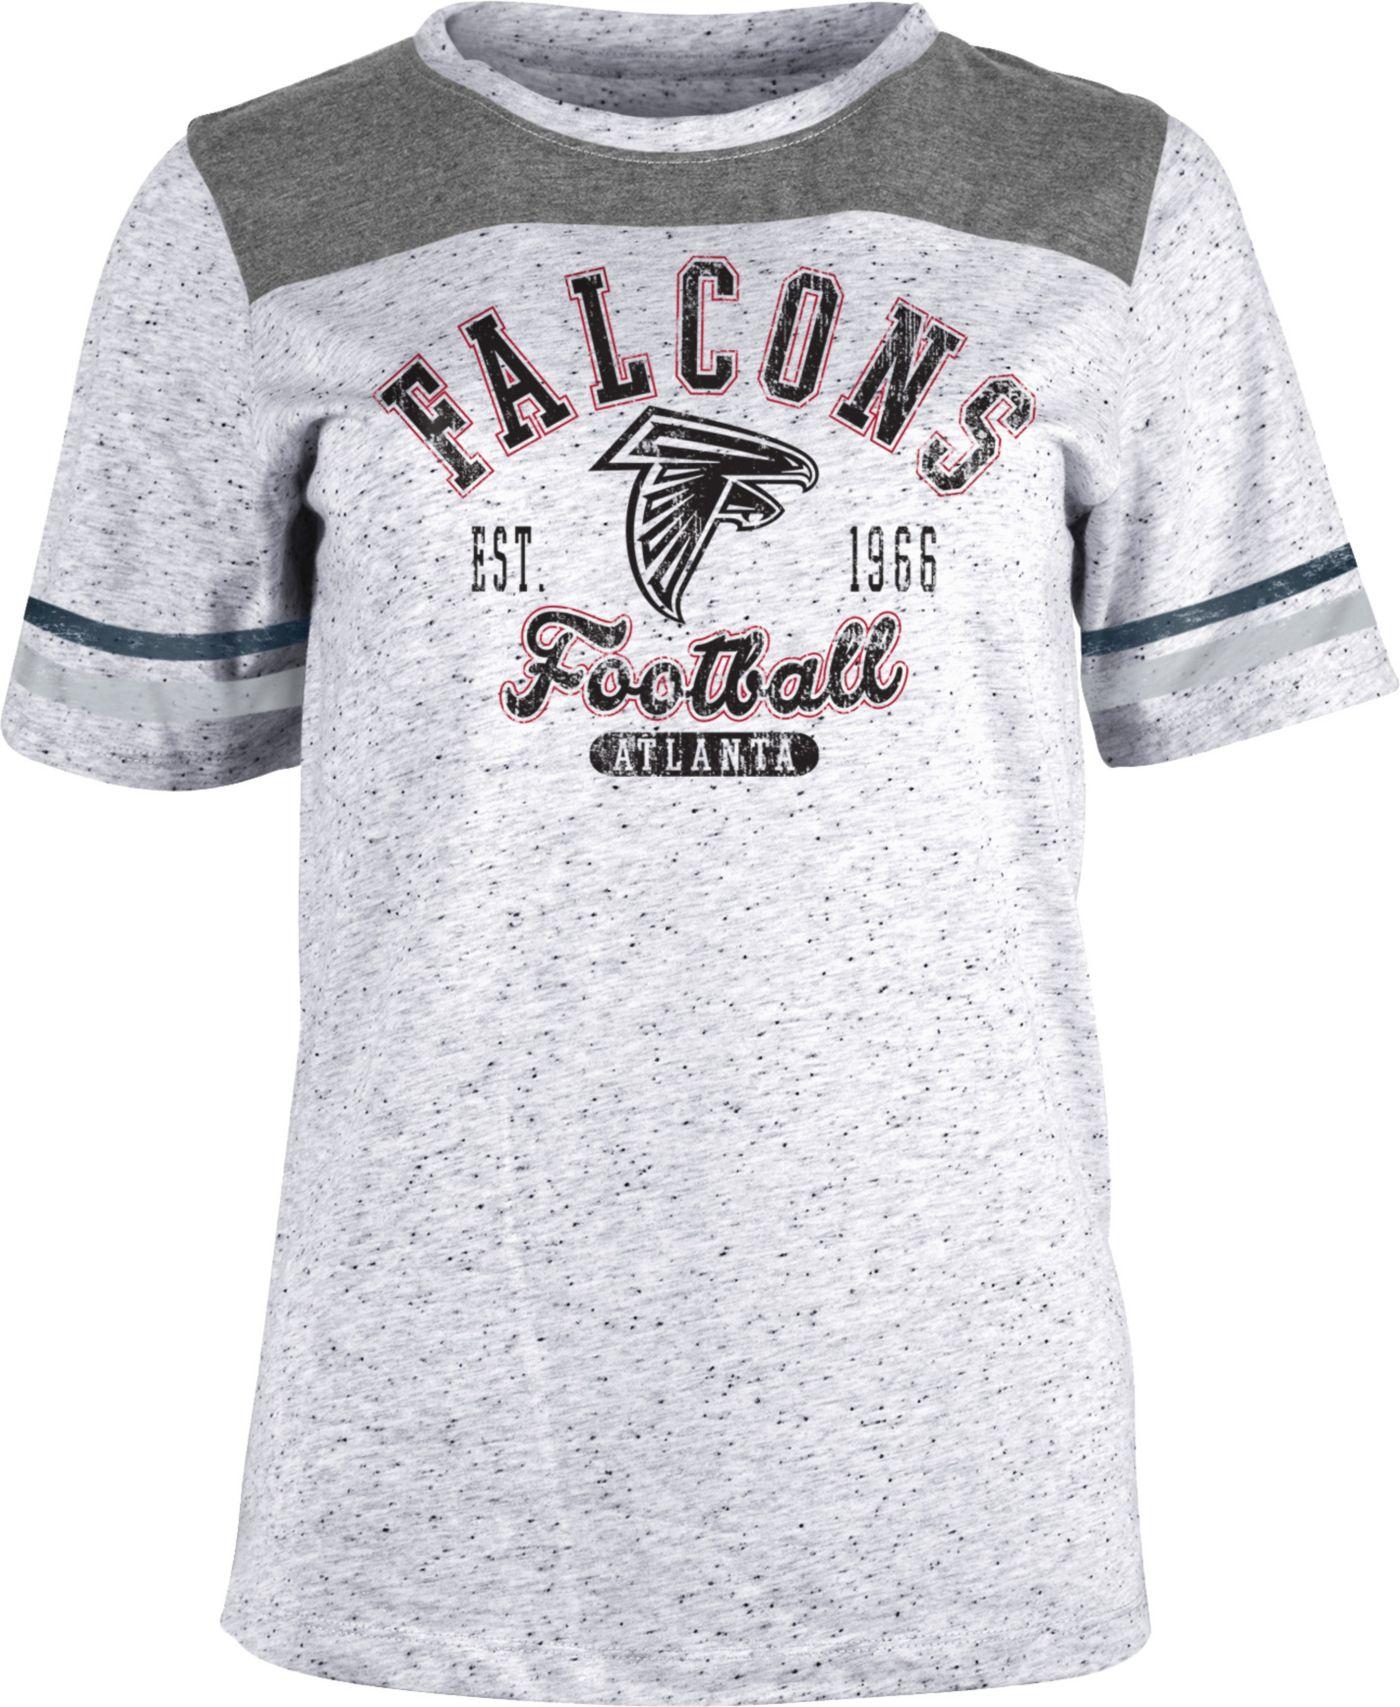 NFL Team Apparel Women's Atlanta Falcons Peppercorn T-Shirt